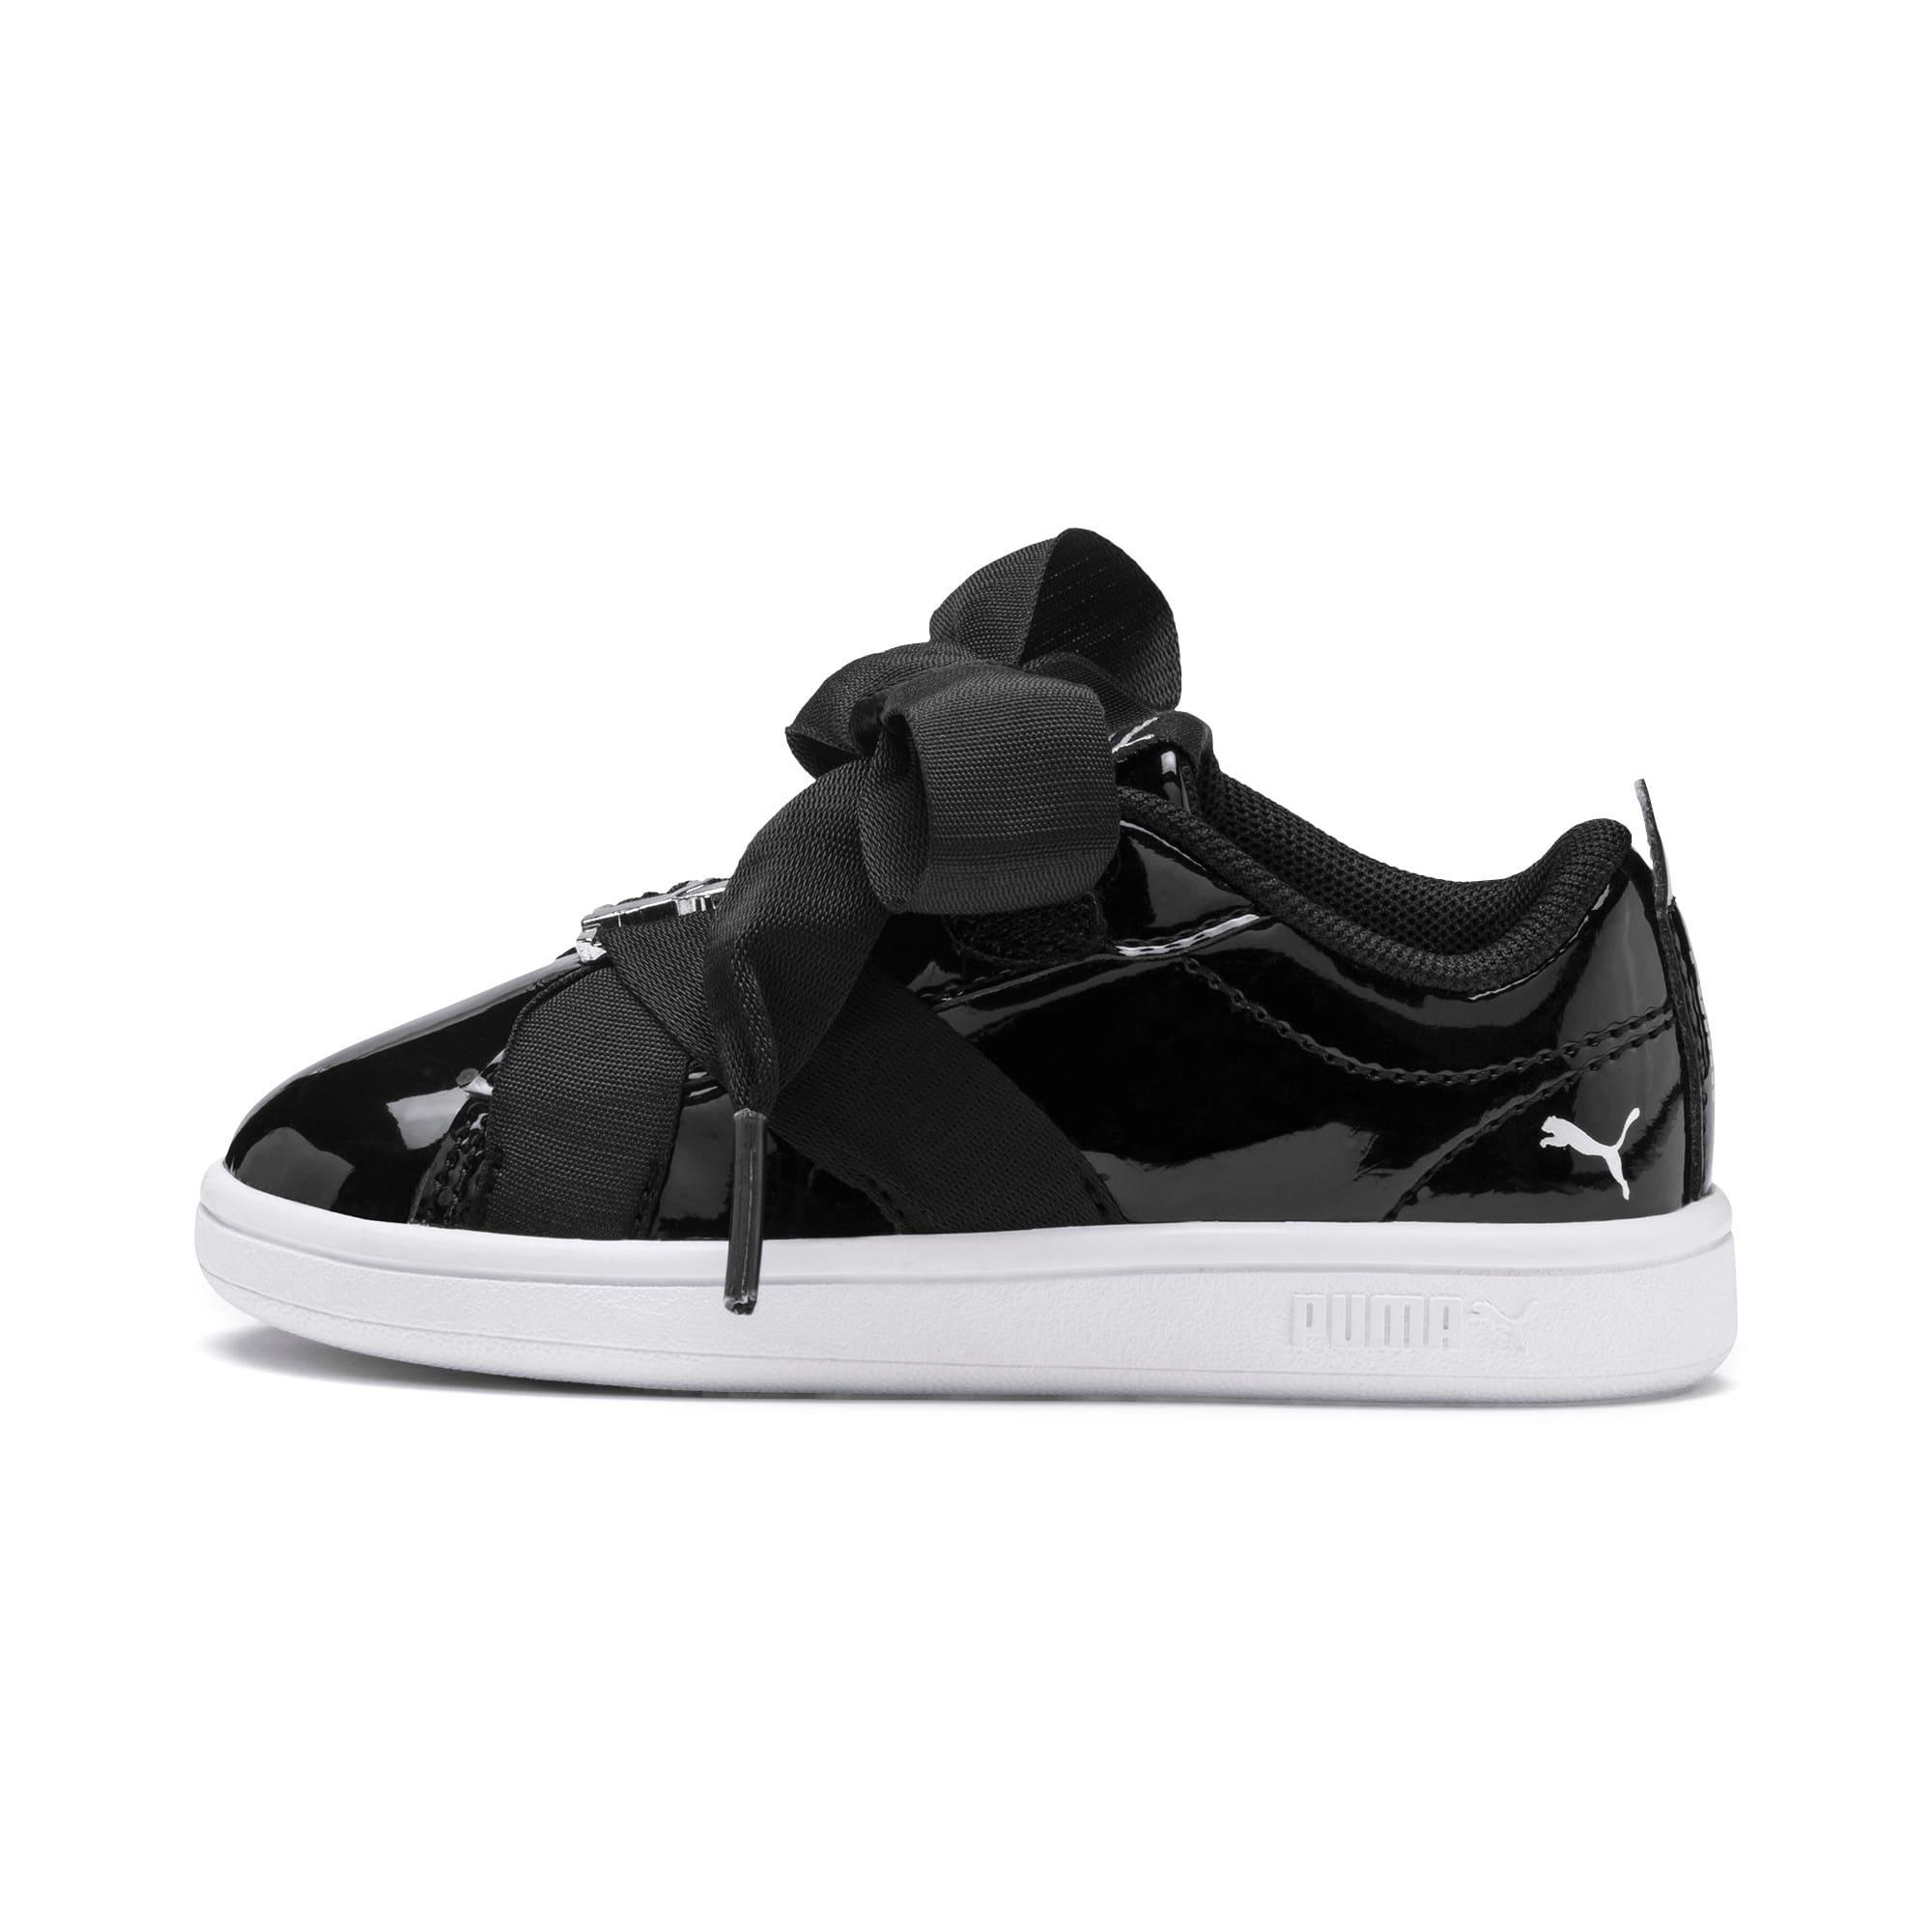 Thumbnail 1 of PUMA Smash v2 Patent Buckle AC Toddler Shoes, Puma Black-Puma Silver-White, medium